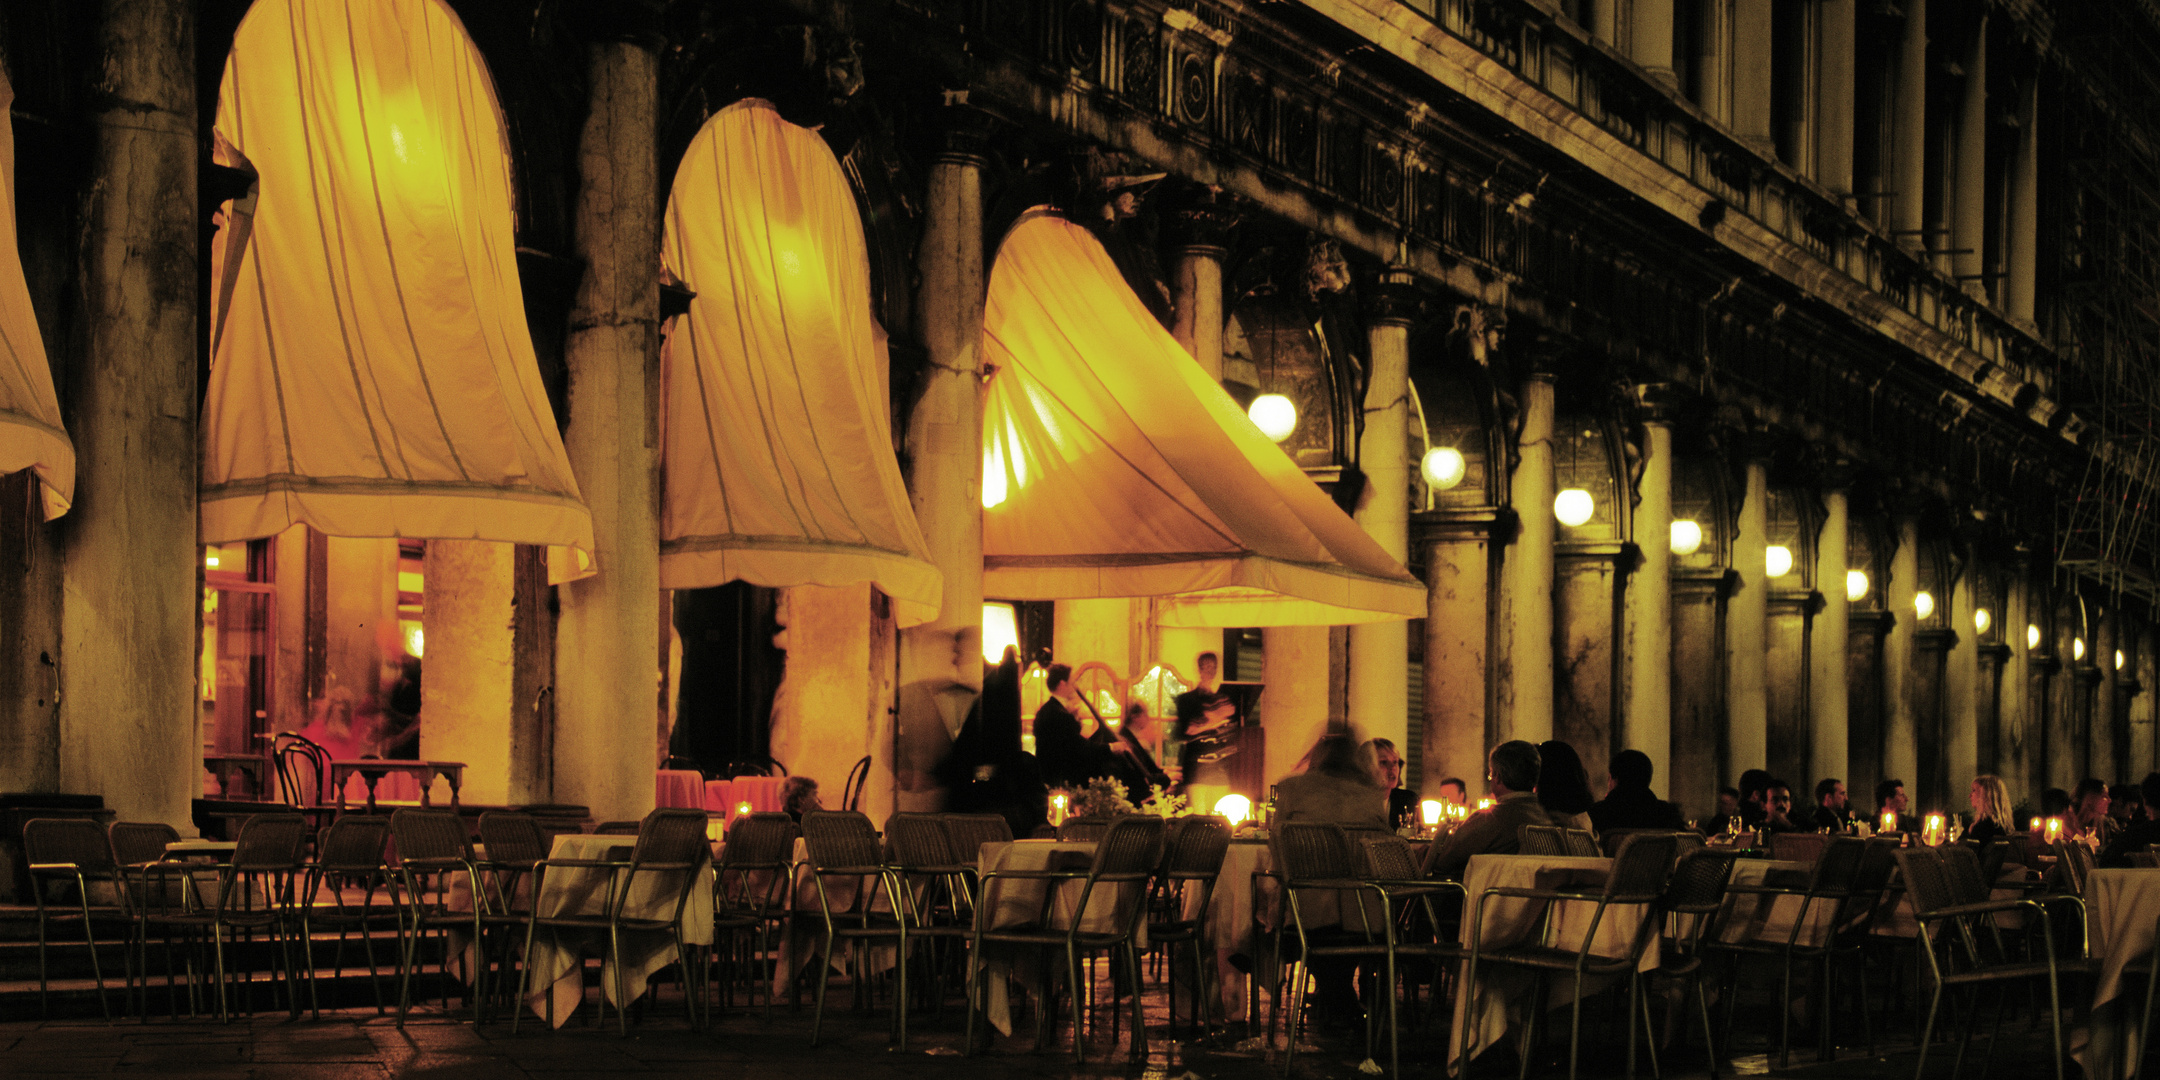 Grancaffè Quadri am Marktplatz in Venedig